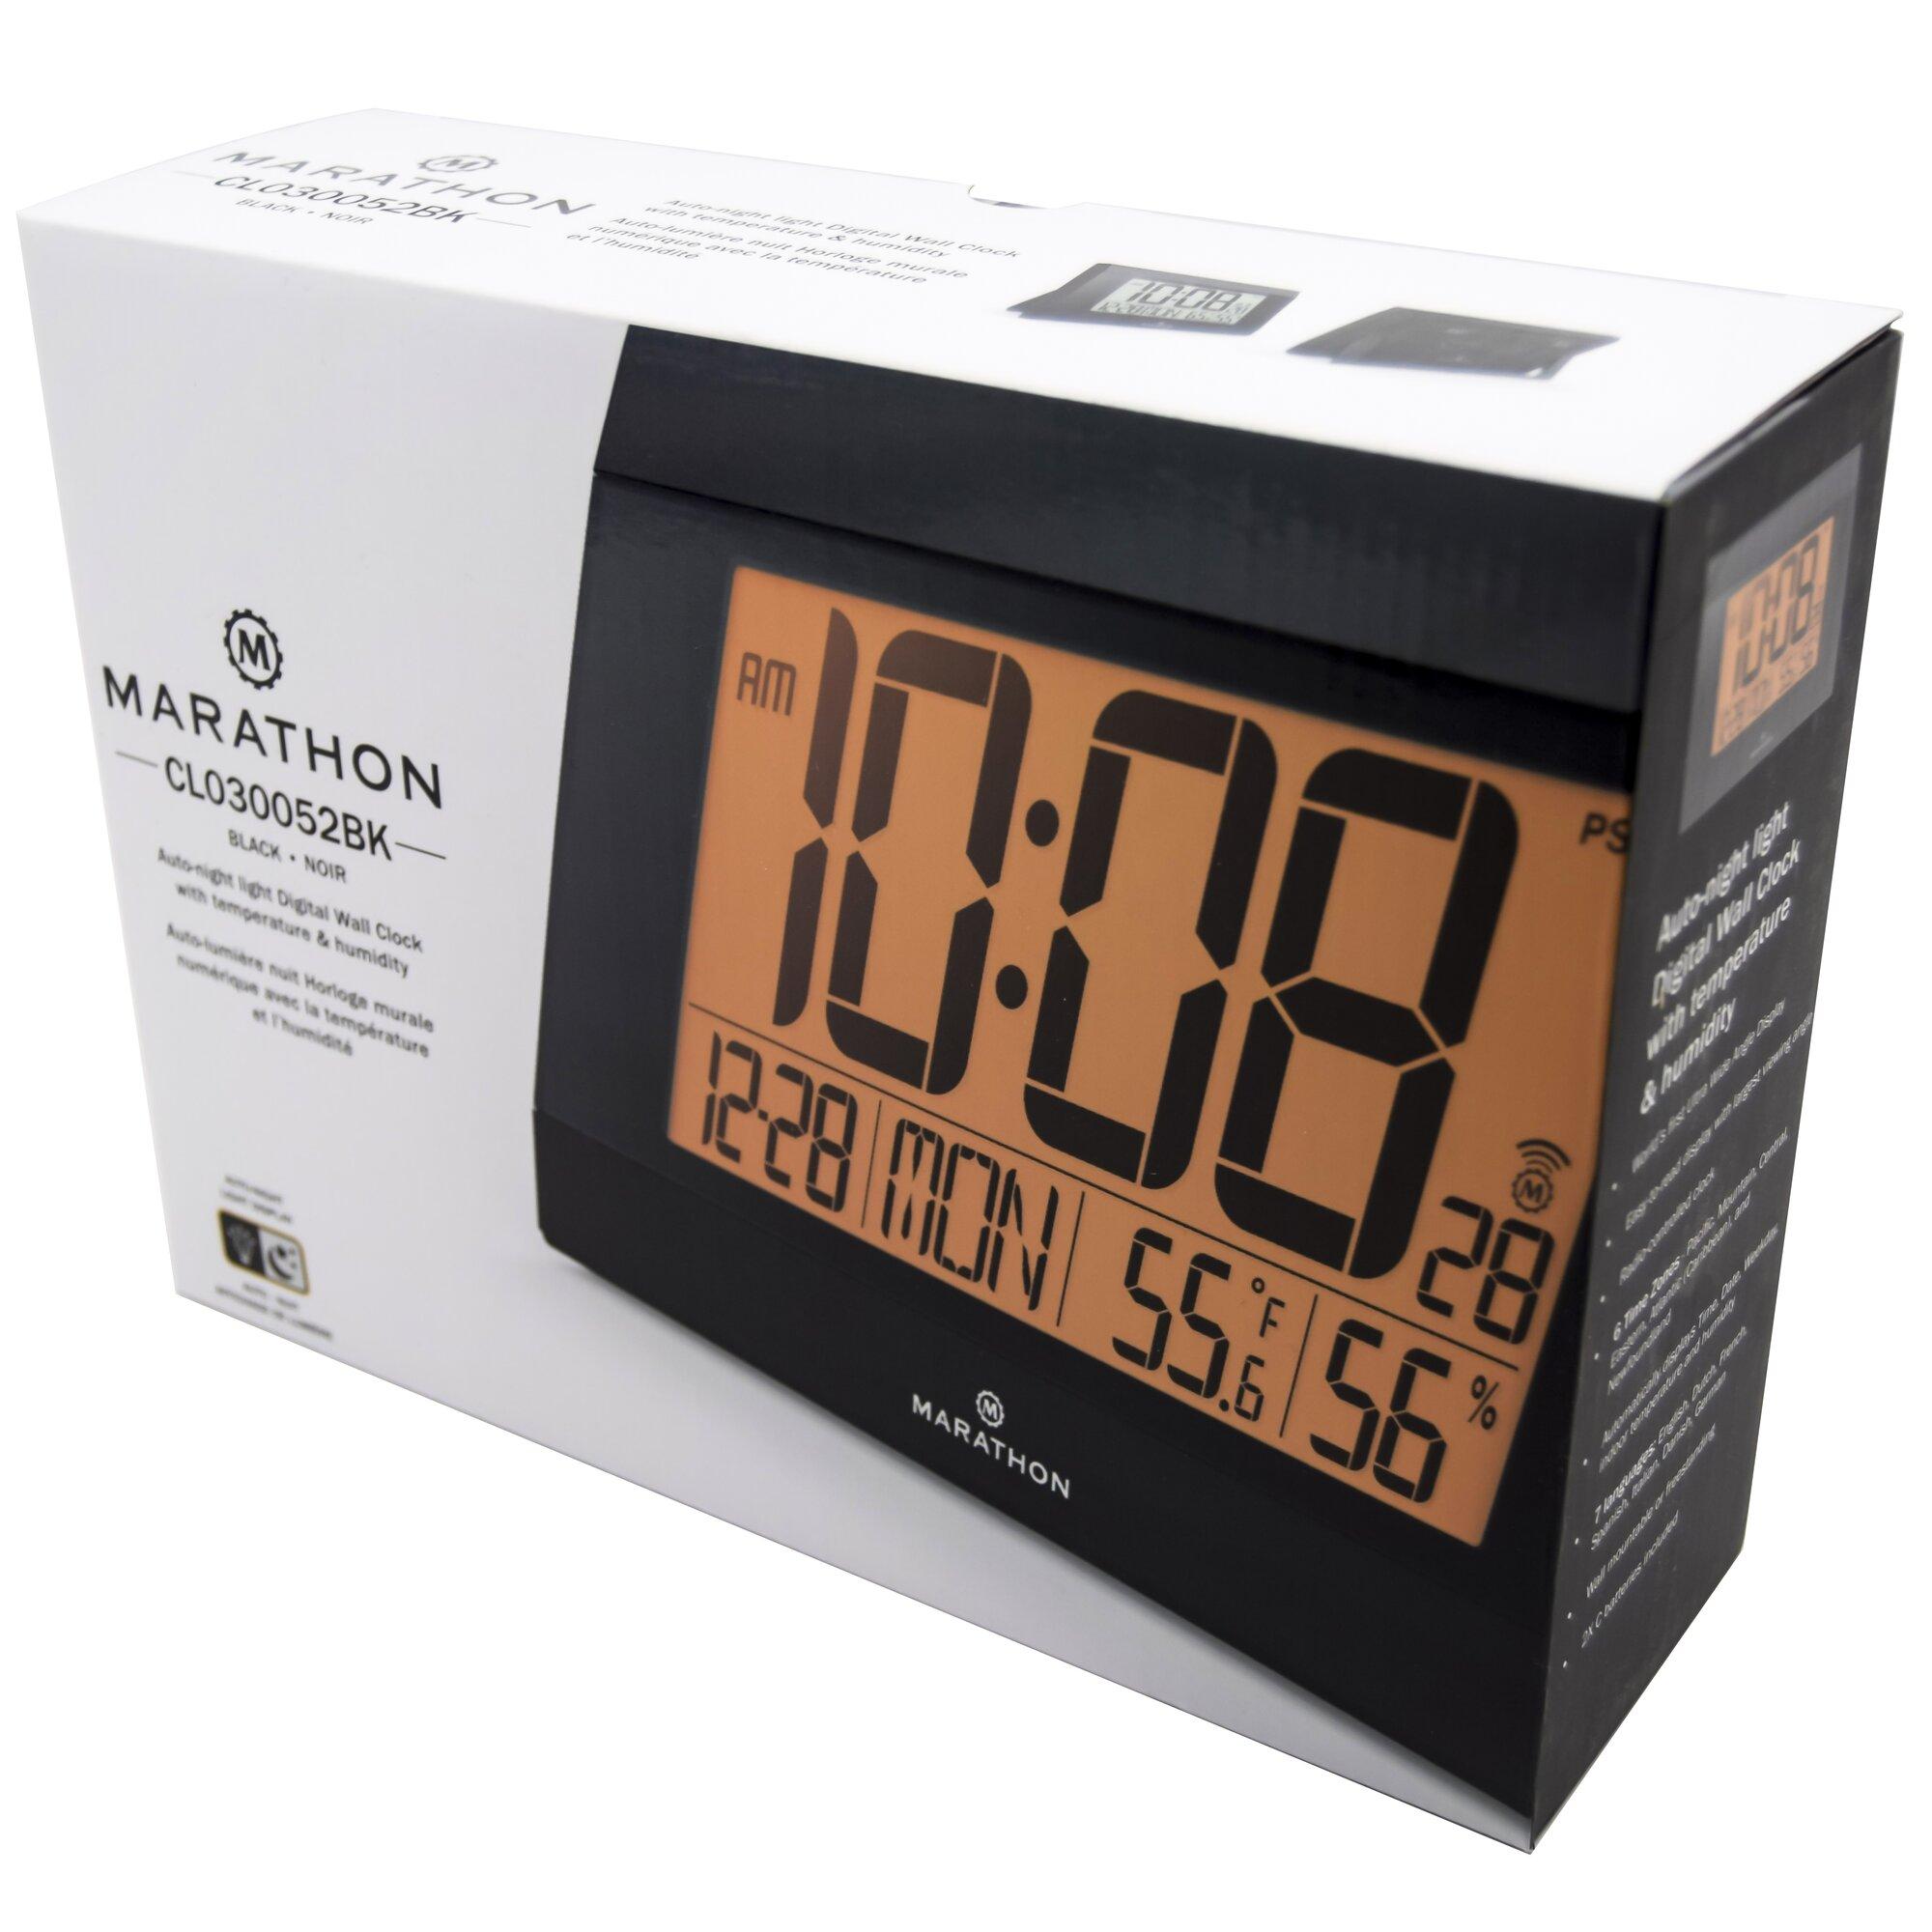 Marathon Watch Company Atomic Digital Wall Clock With Auto